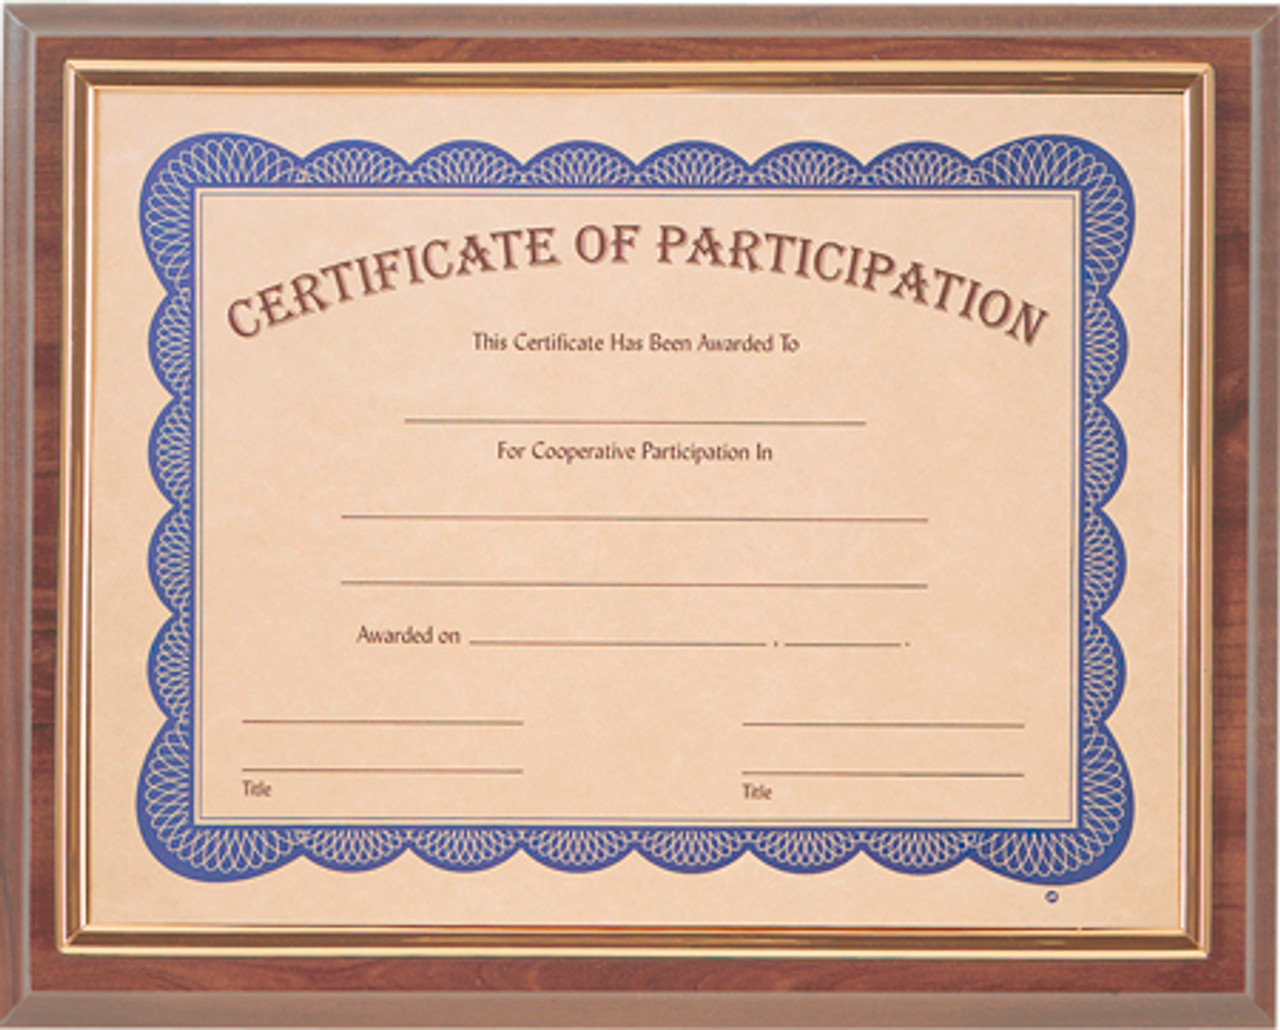 Cherry Slide-In Framed Certificate Plaque